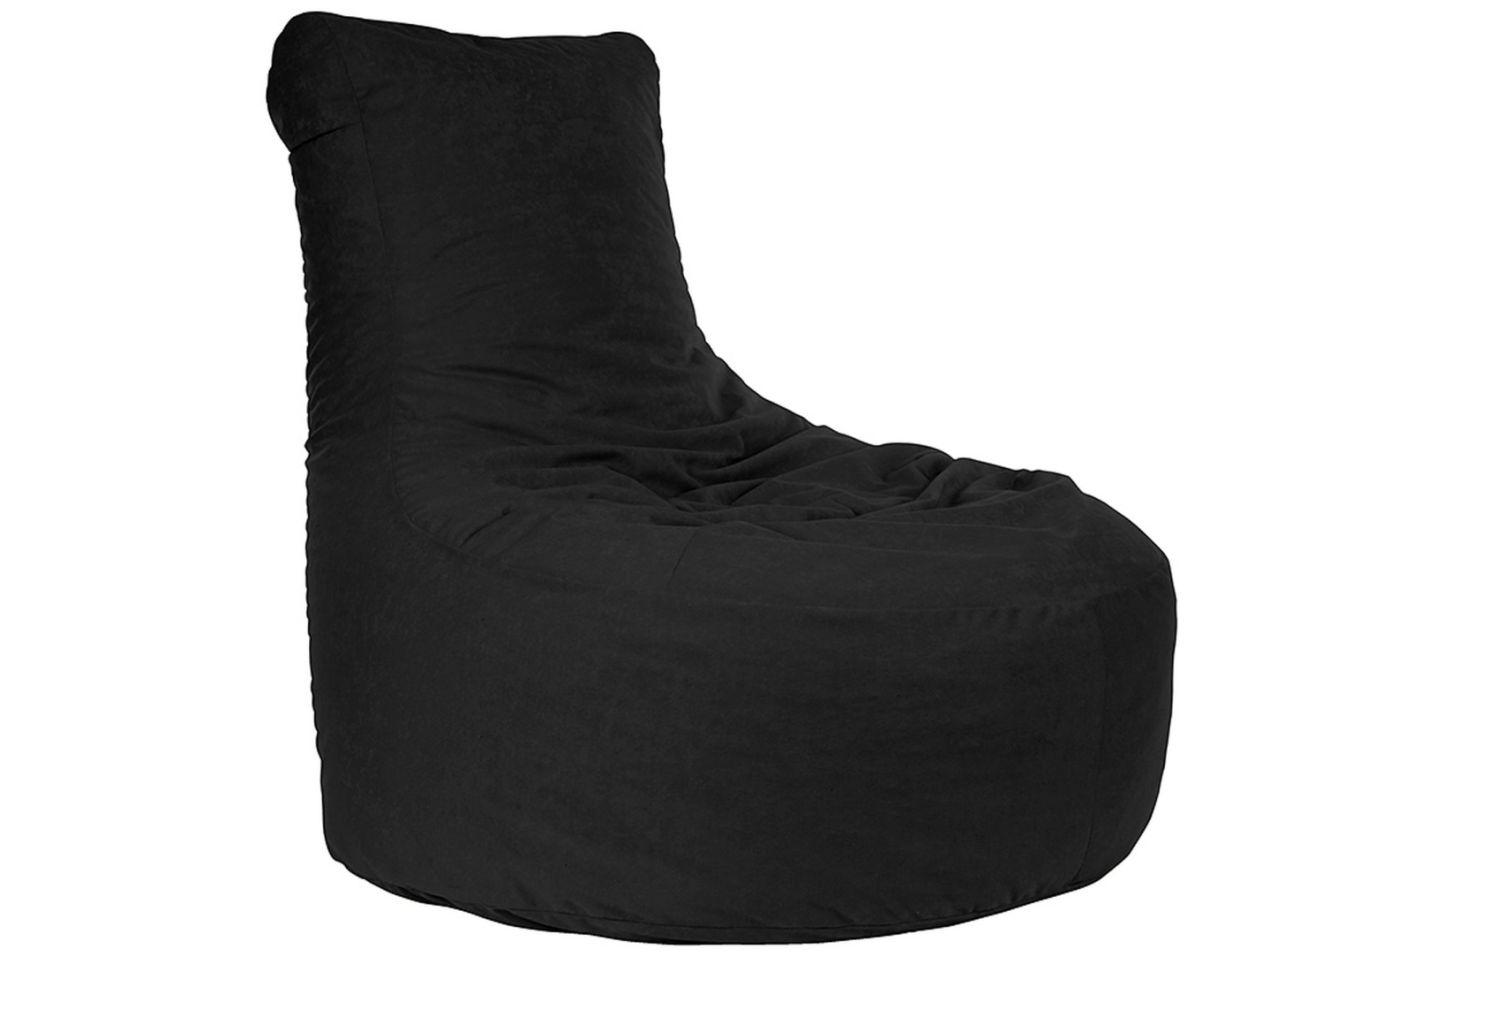 Hogga Sitzsack 509980 schwarz